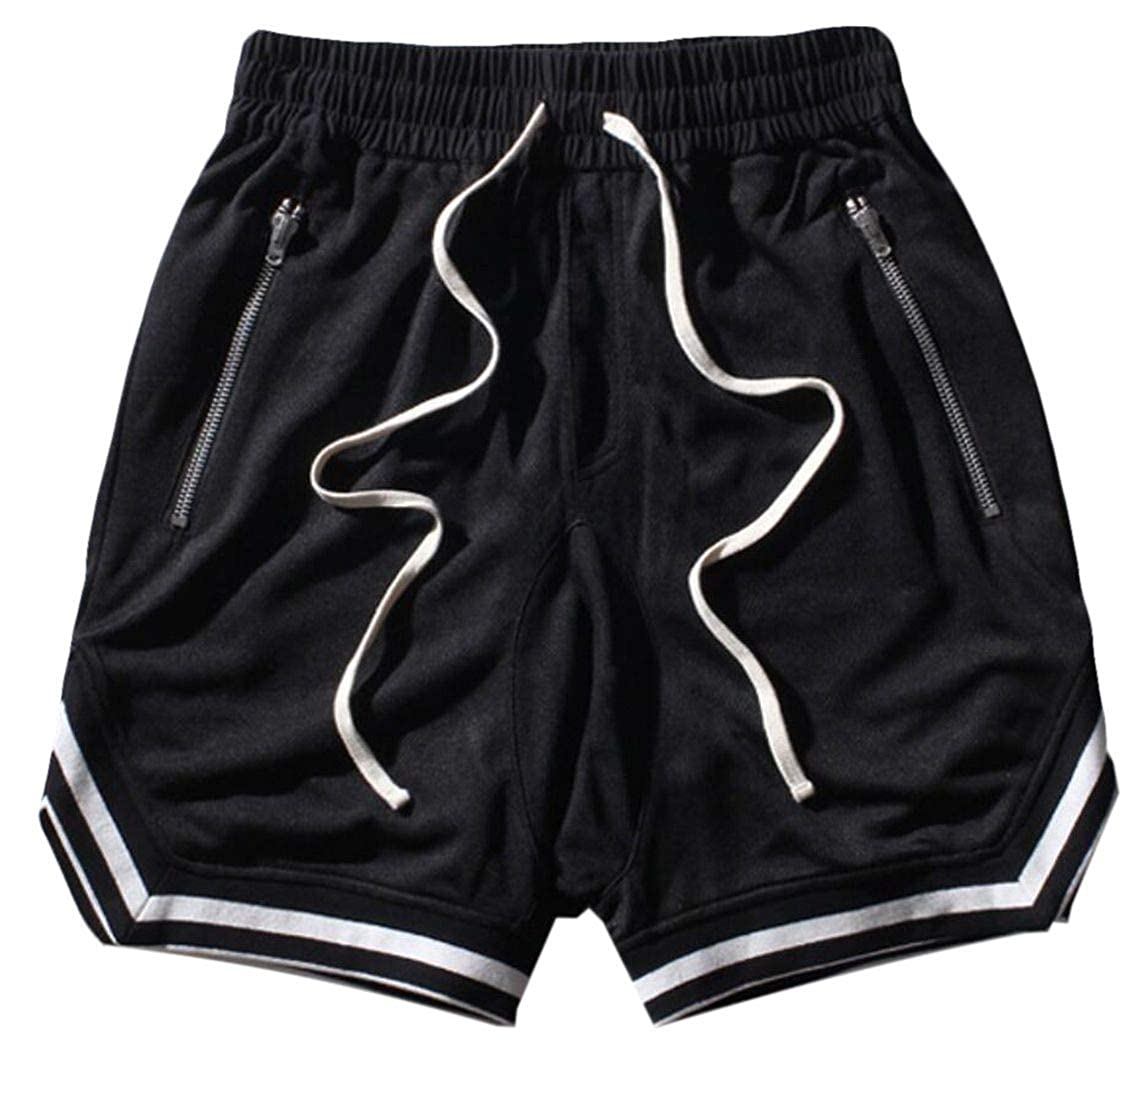 YYear Mens Zip Pockets Hip hop Patchwork Beach Shorts Boardshort Swim Trunk